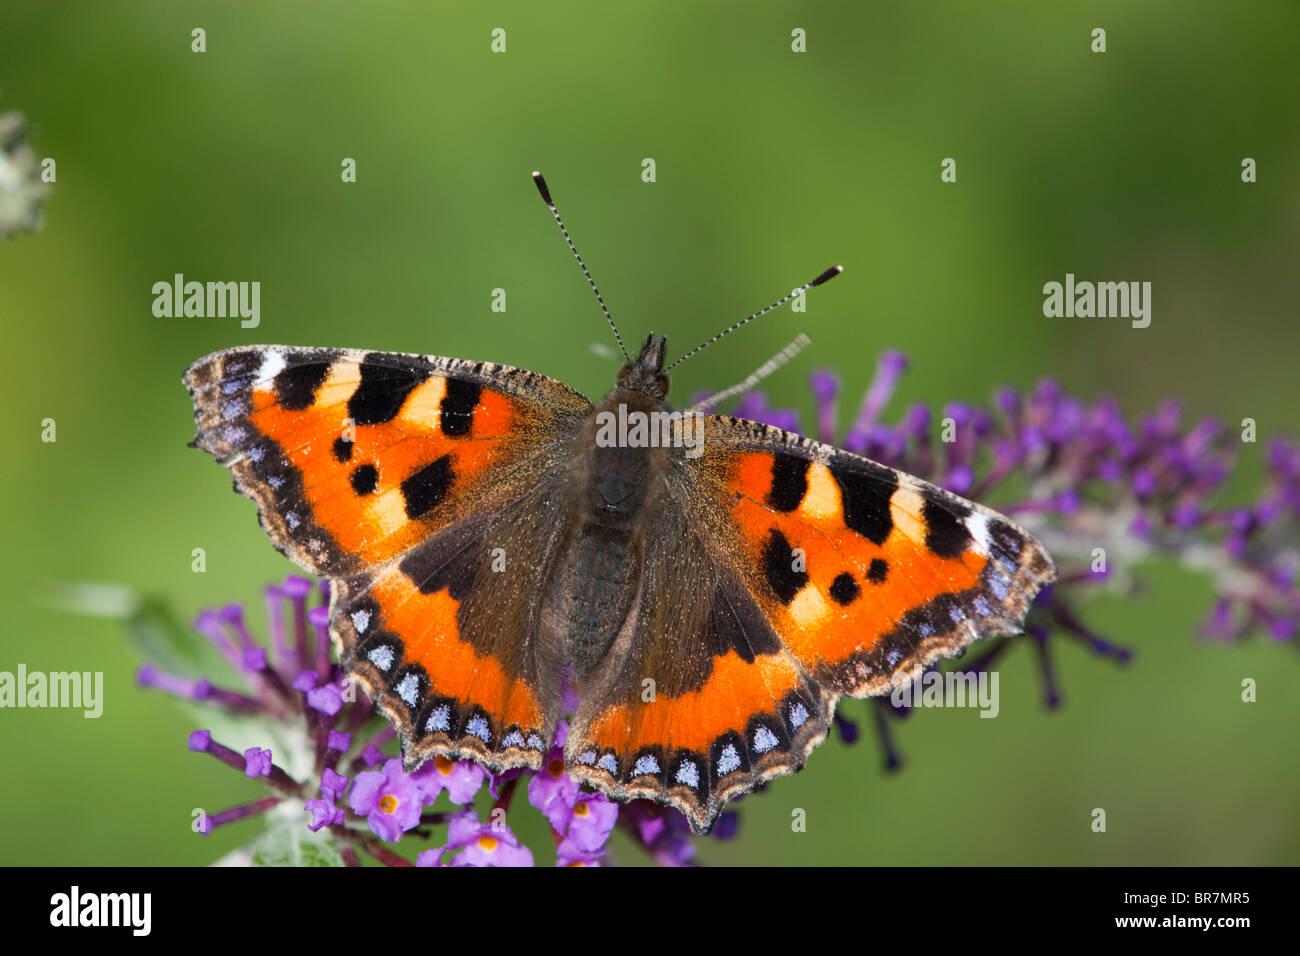 Small Tortoiseshell Butterfly; Aglais urticae; on buddleia - Stock Image